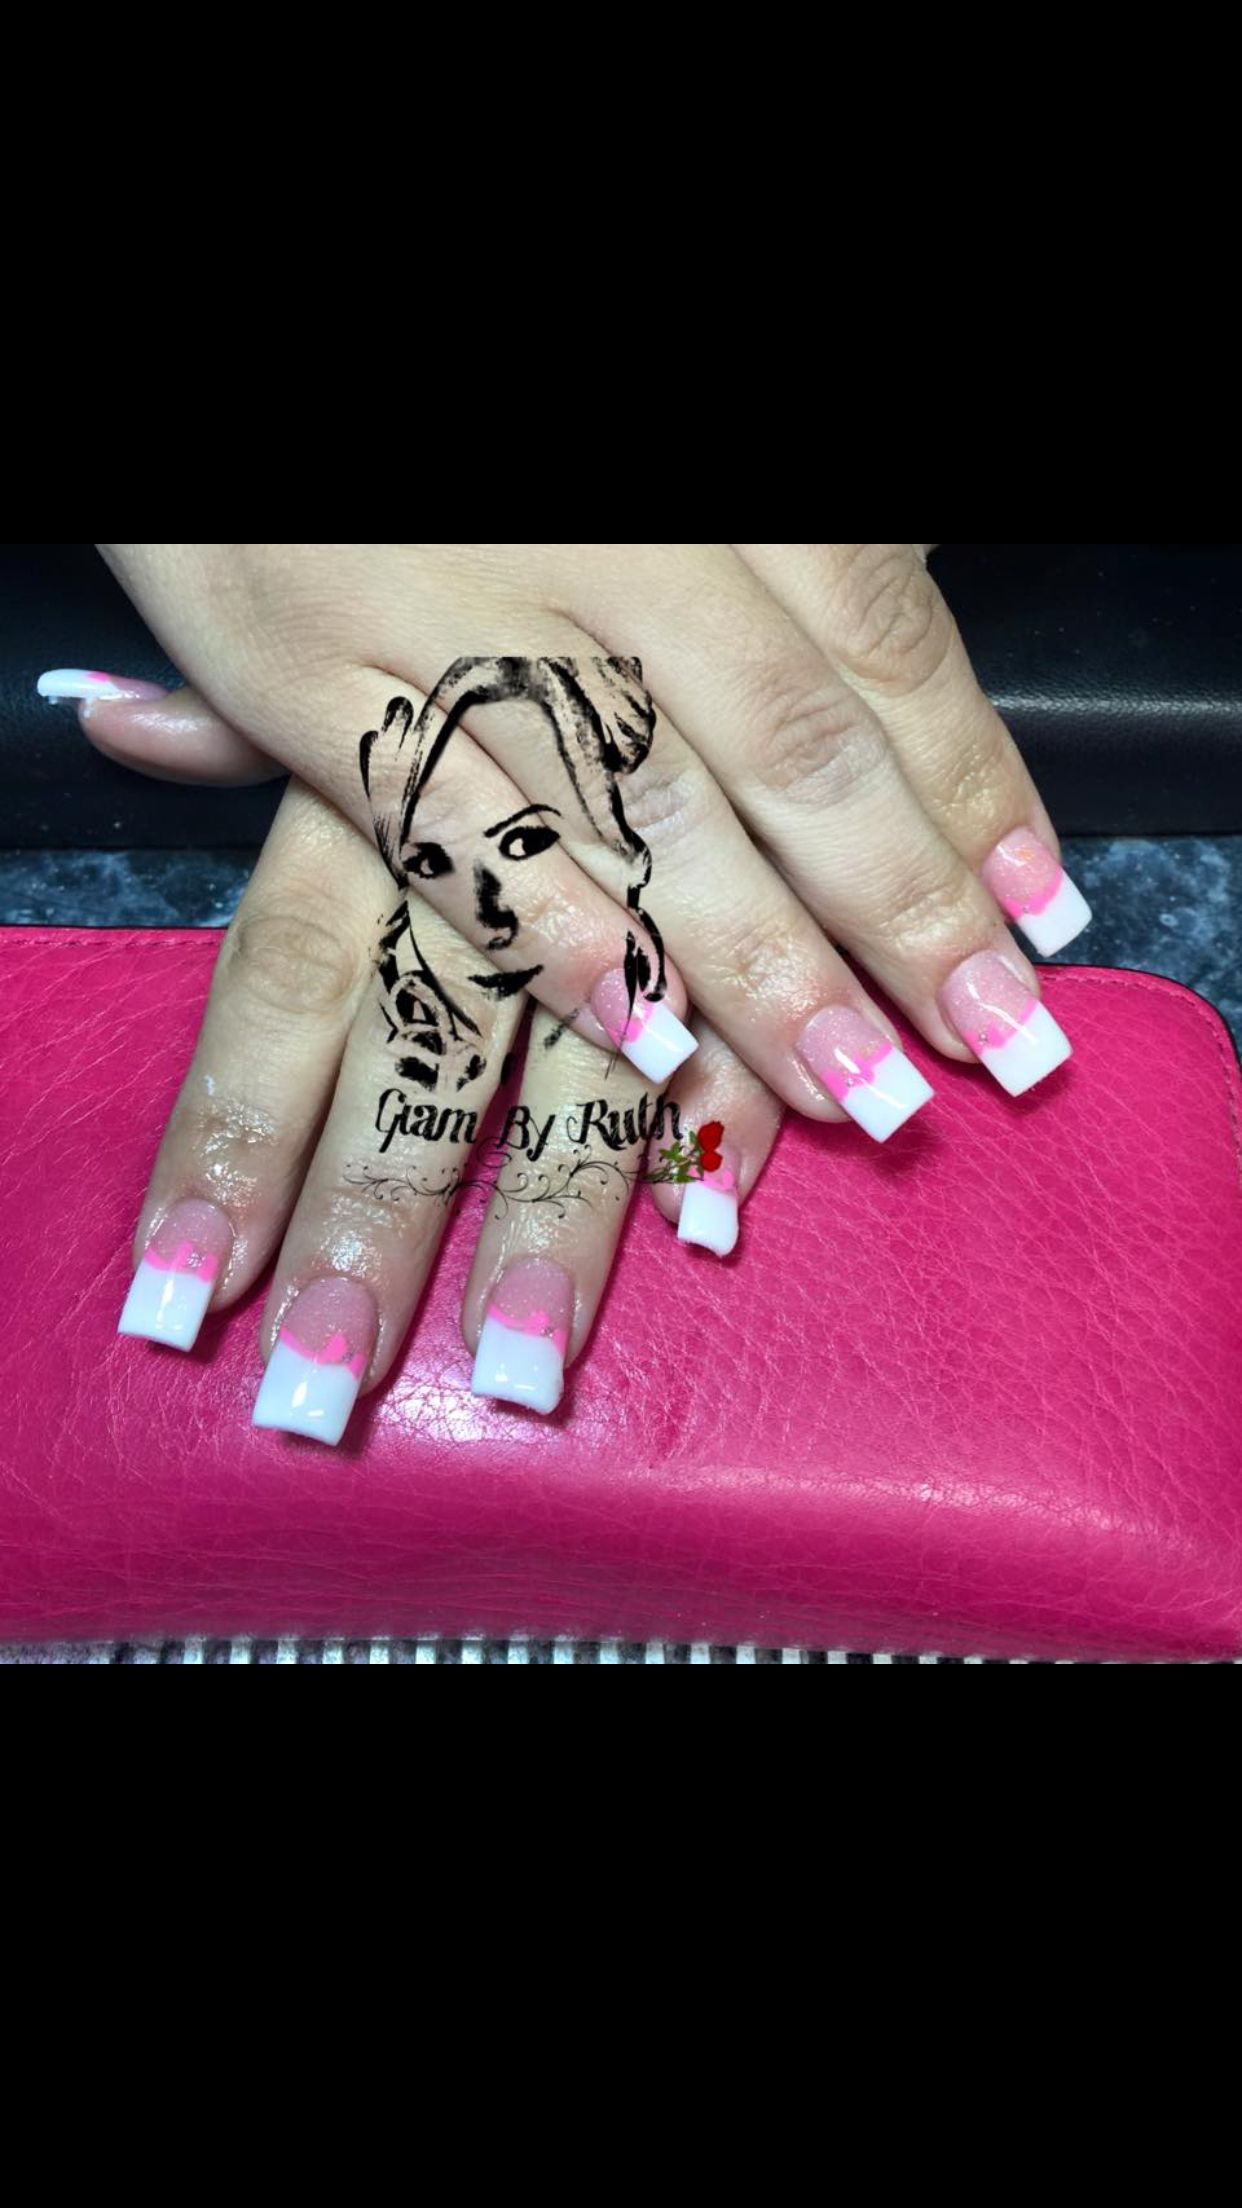 LG Salon, Lemon Grove Nail Art, Nail Design, nail, acrylic